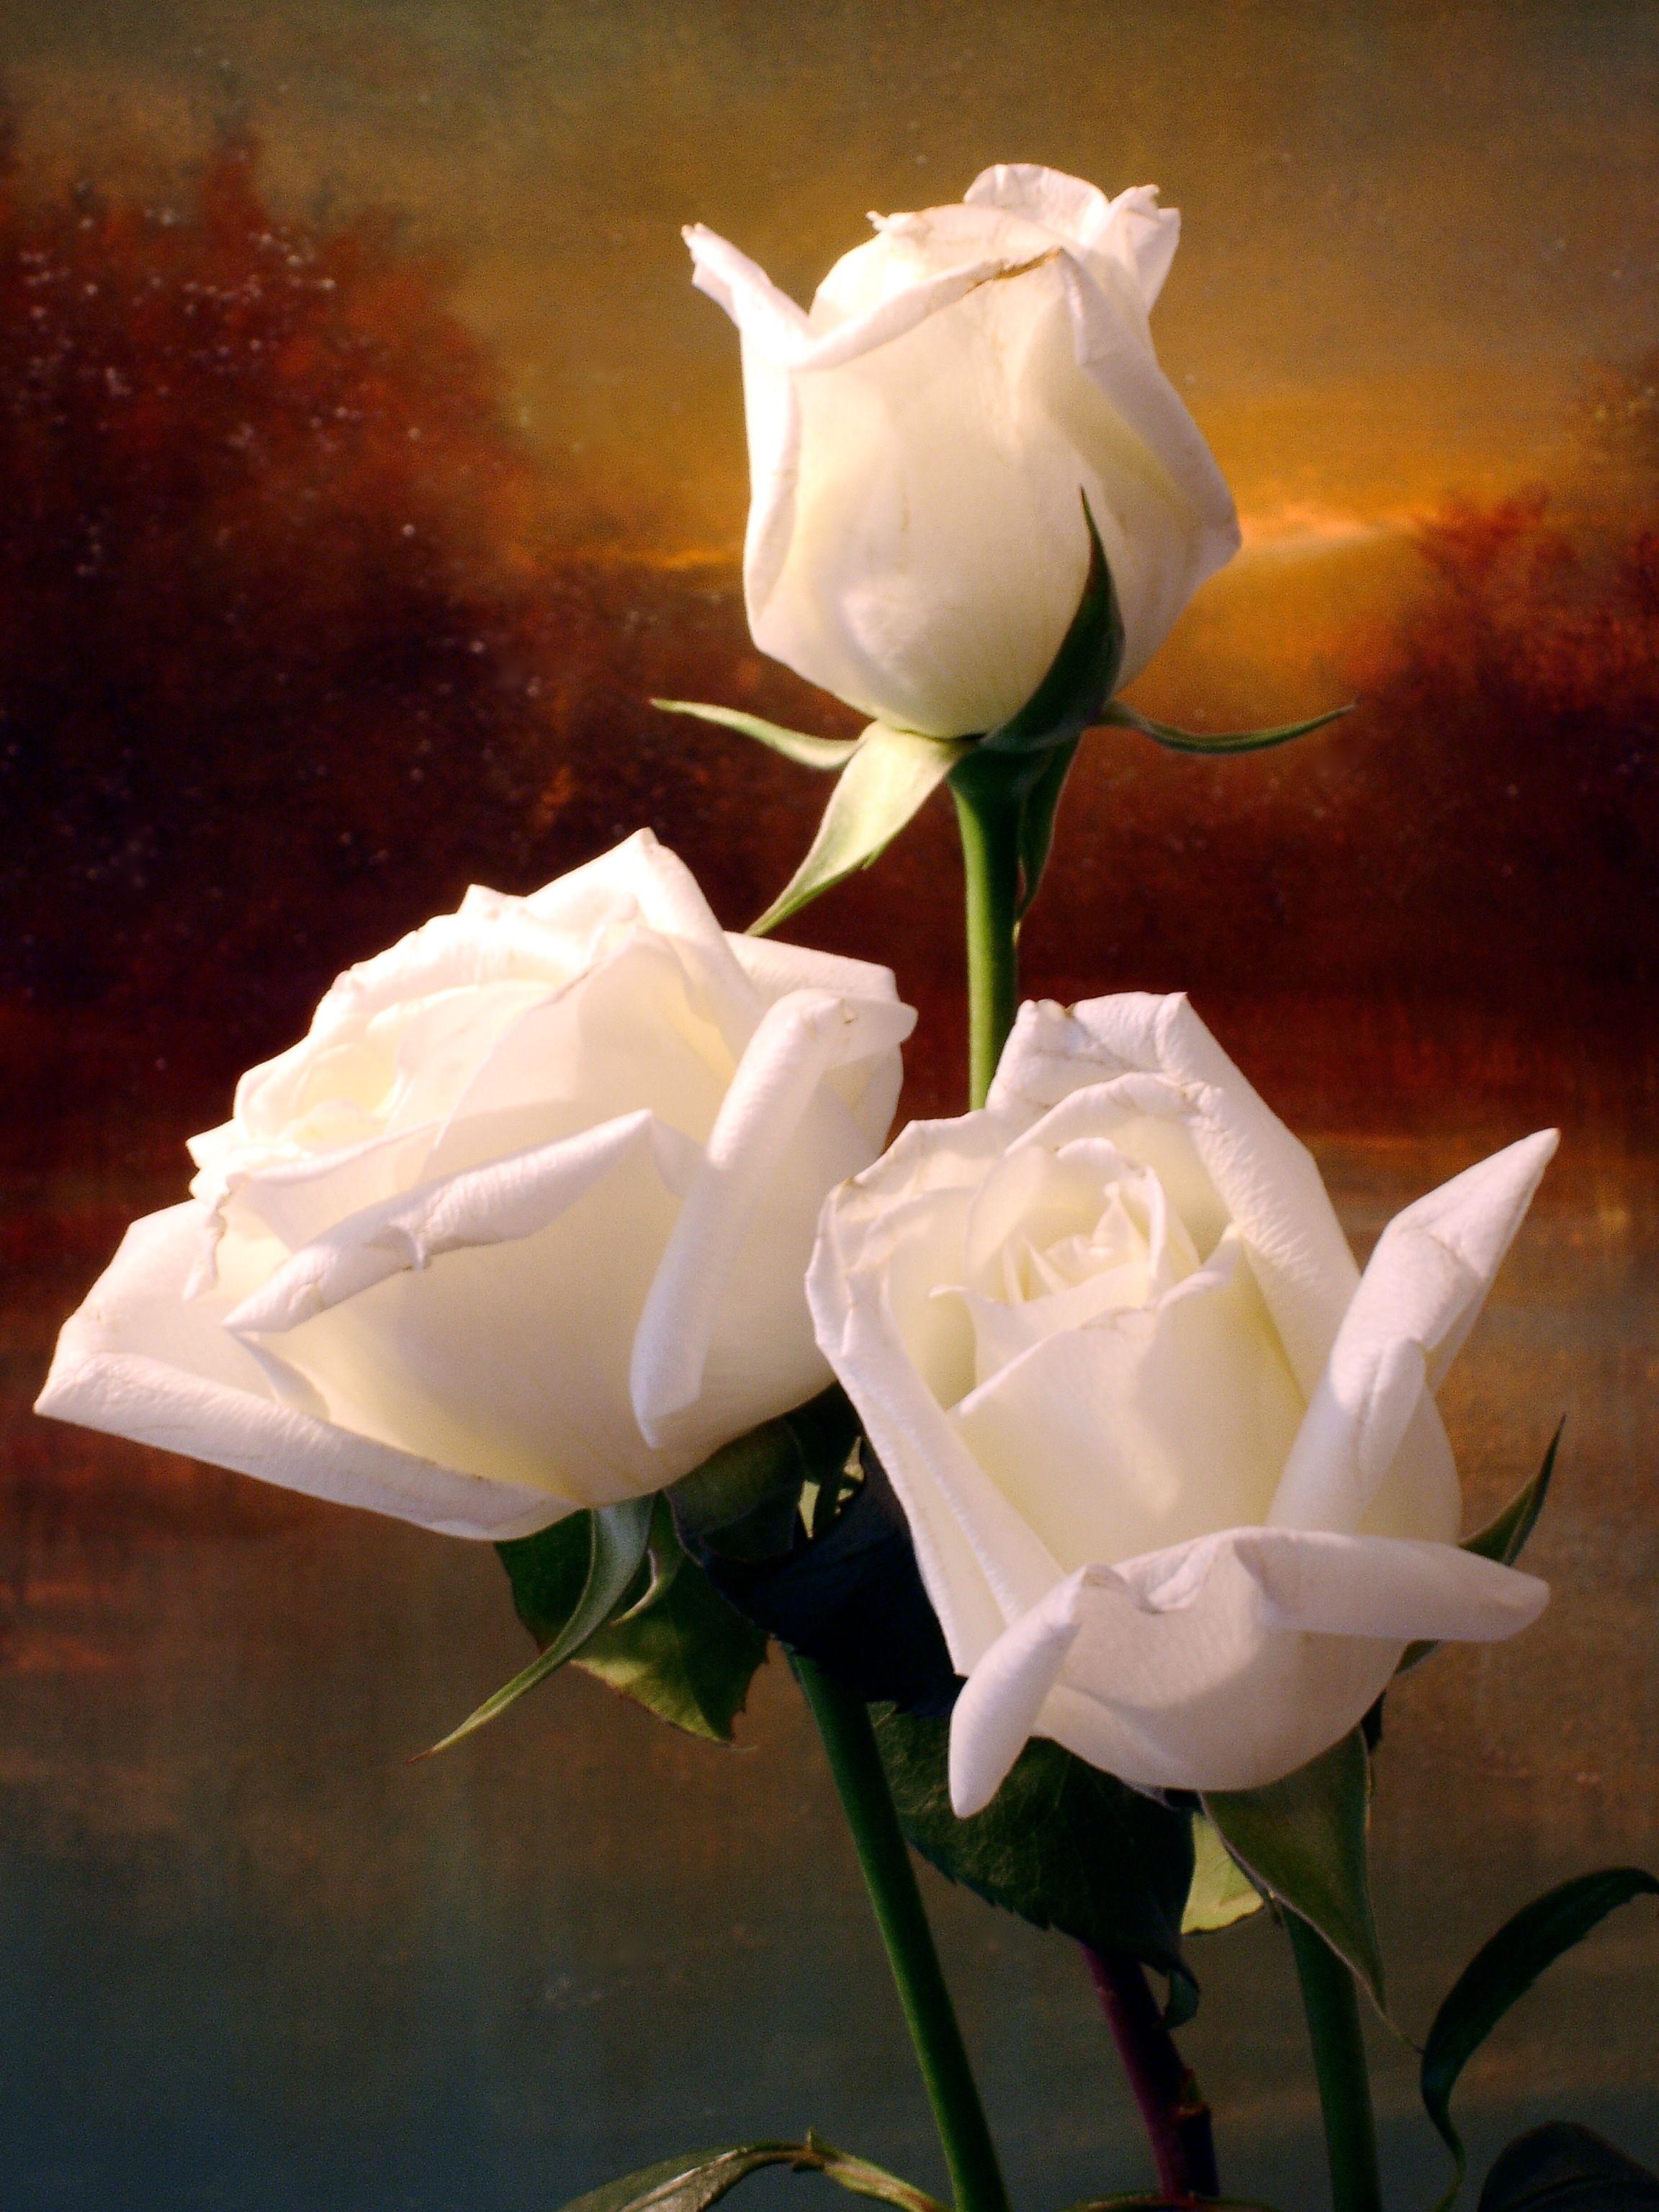 Sunrise Roses Maurice Sapiro Rose Beautiful Flowers Beautiful Roses